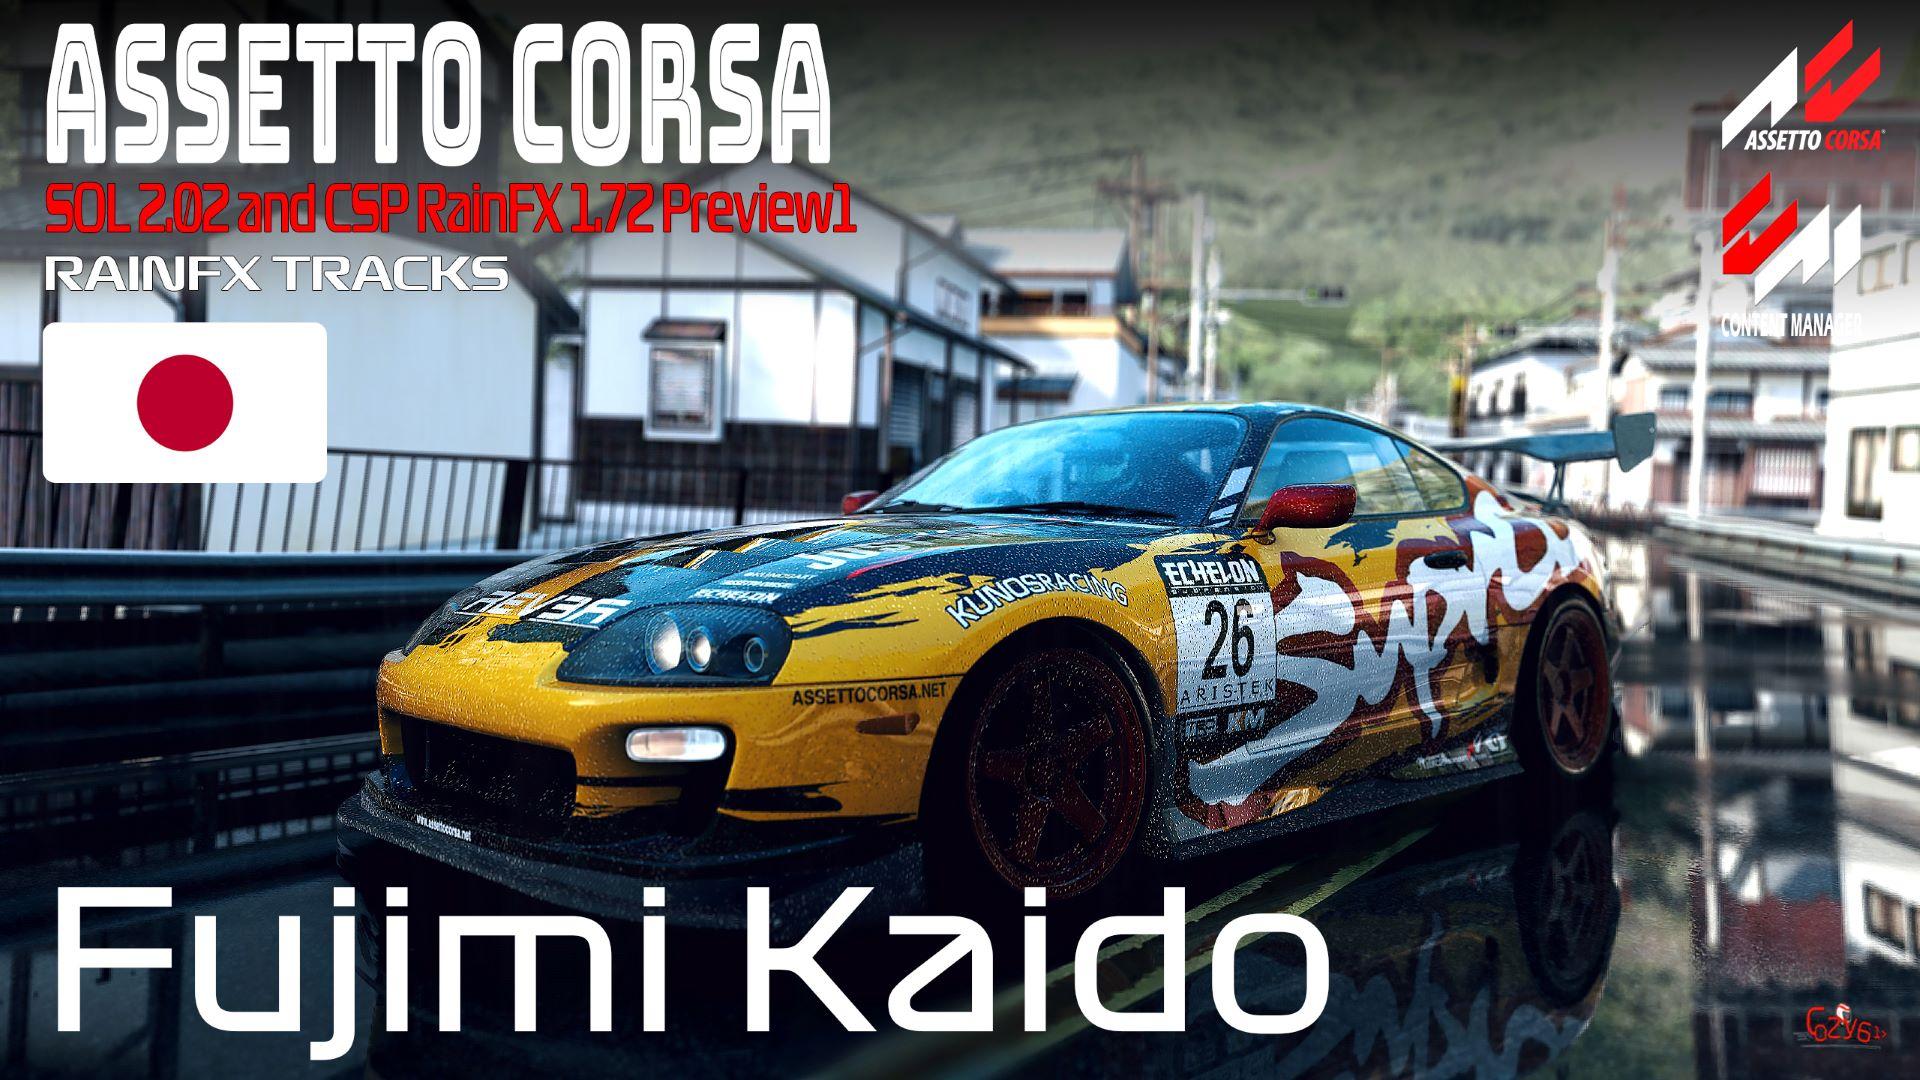 fujimi_kaido_rainfx track bg (Large).jpg